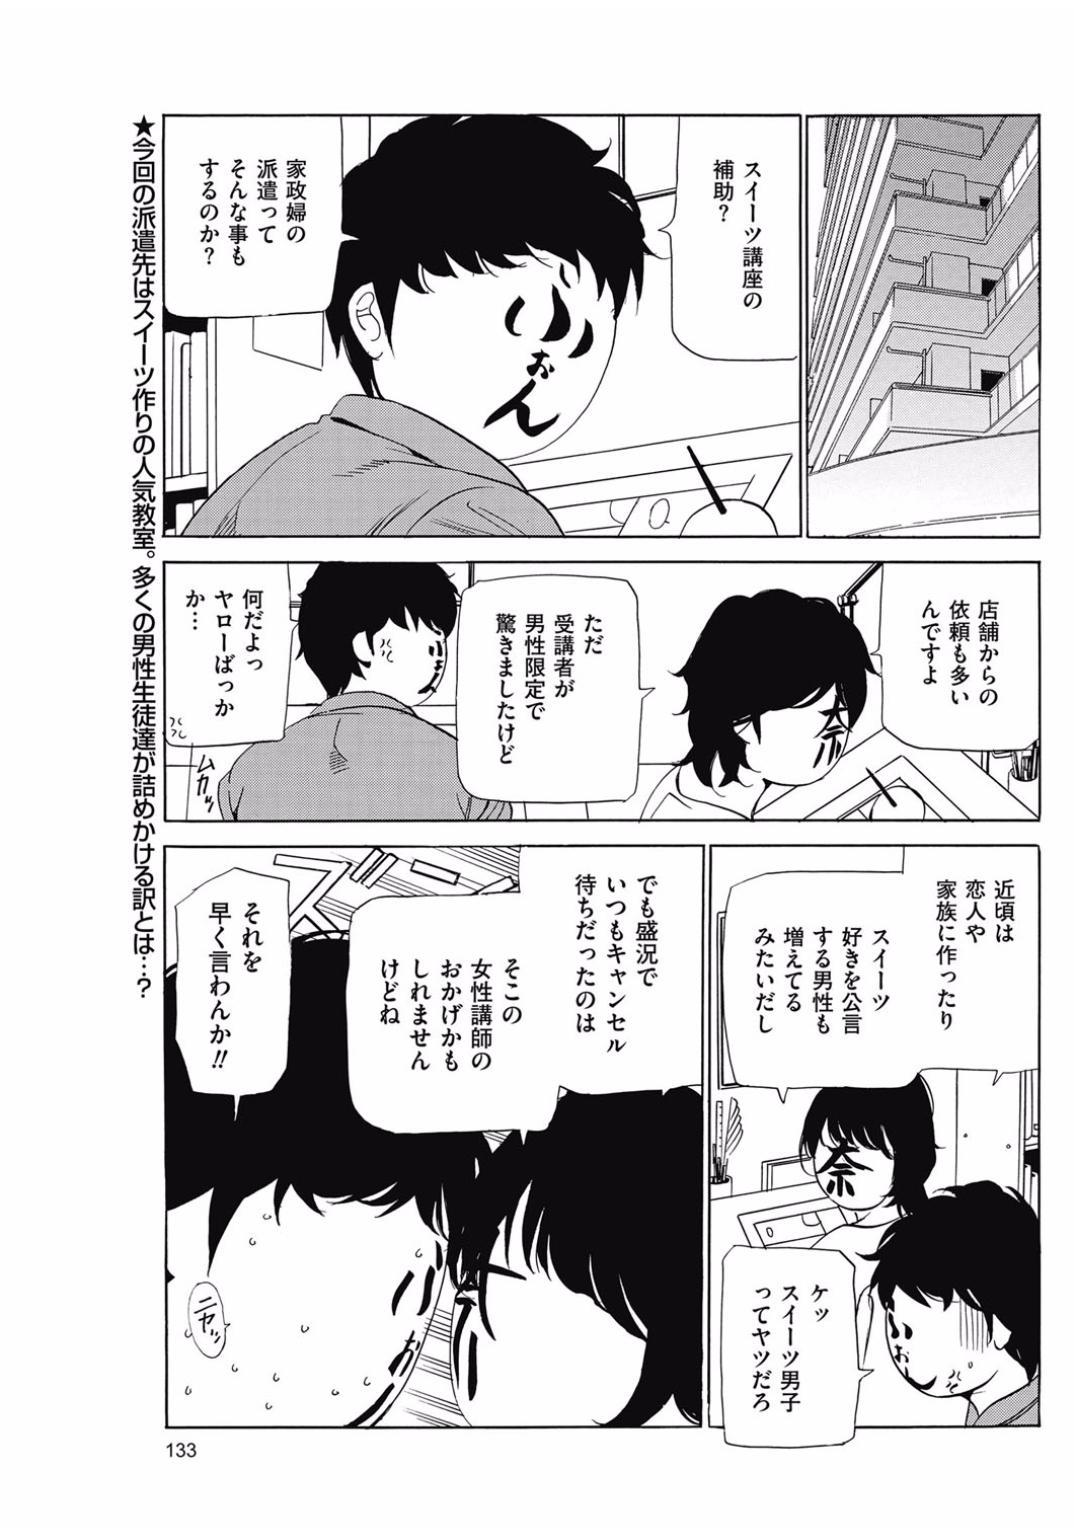 Wa Usuki Ipa a 1-10 73